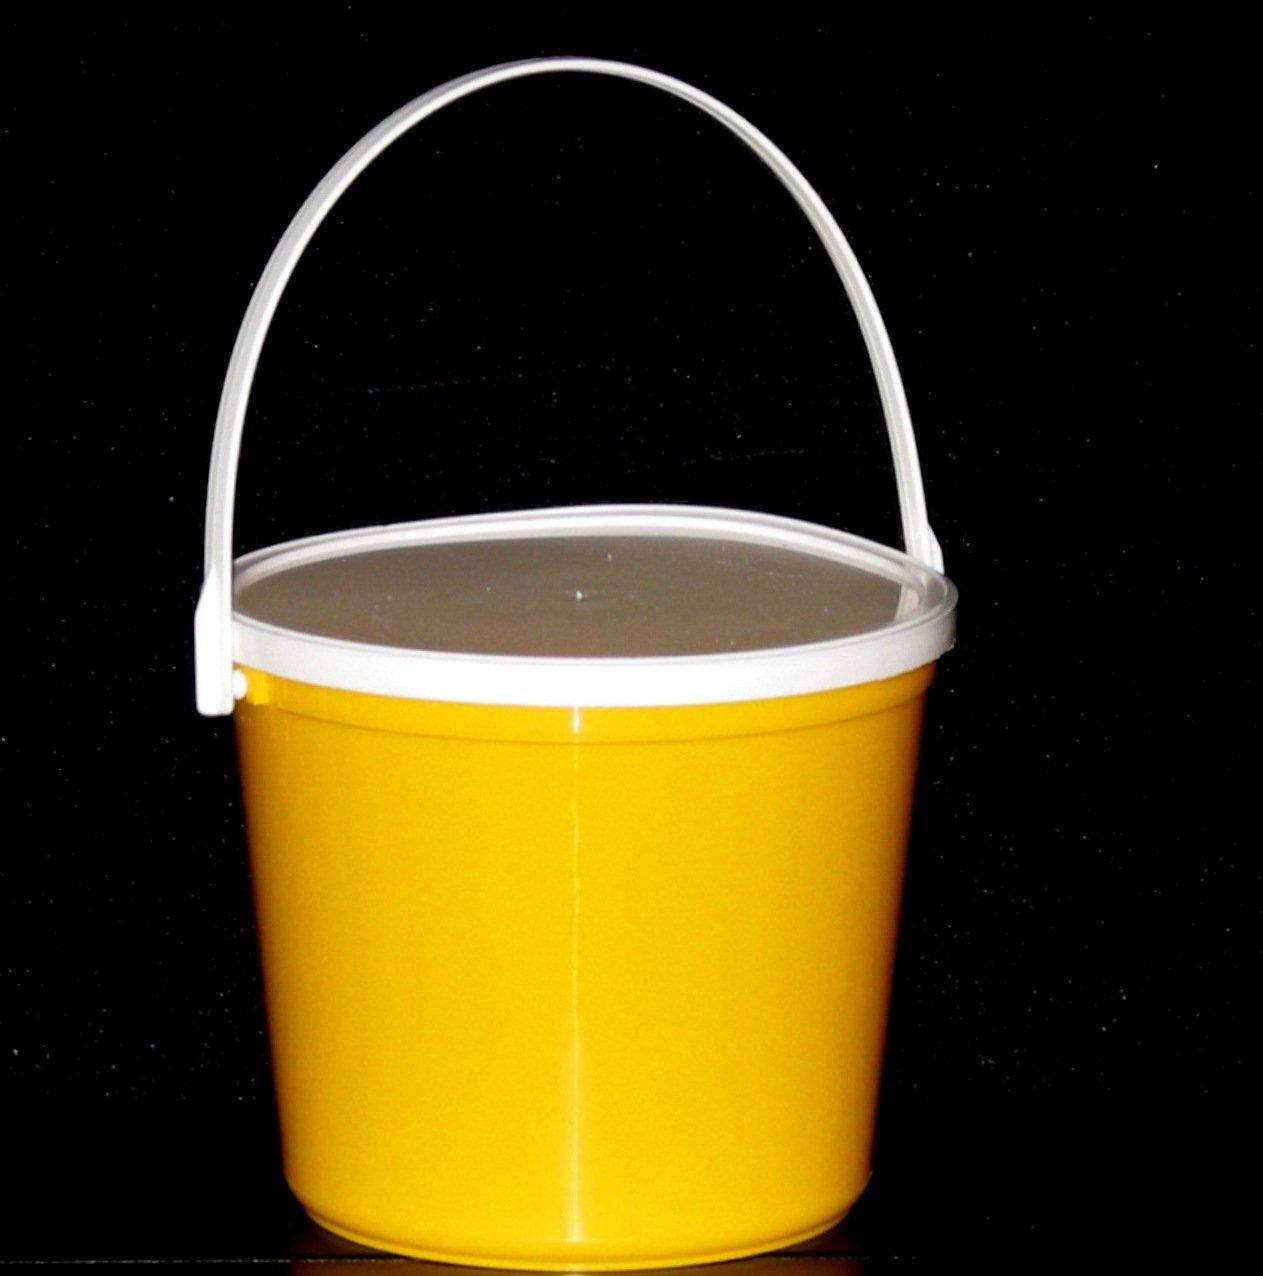 Plastic Buckets & Lids, 80 Ounces, 6 Pack,1 each Red Blue Yellow Orange Purple & Green by Talisman (Image #6)